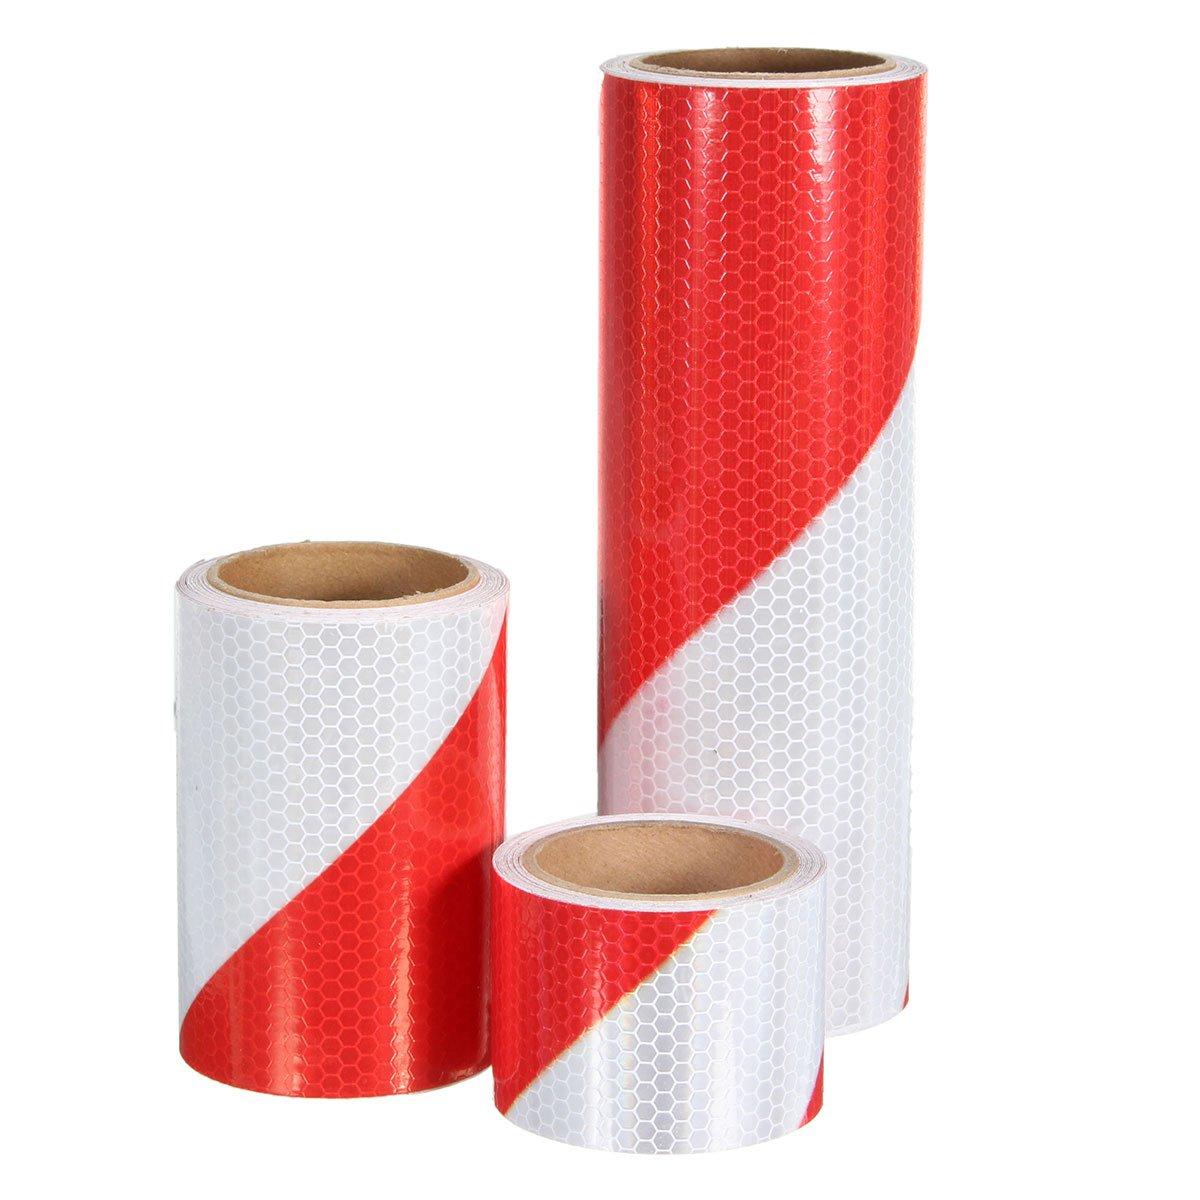 Alamor 5Cm / 10Cm / 20Cm Traffic Warning Safety Night Reflective Strips Adesivo Nastro Adesivo Bianco Rosso